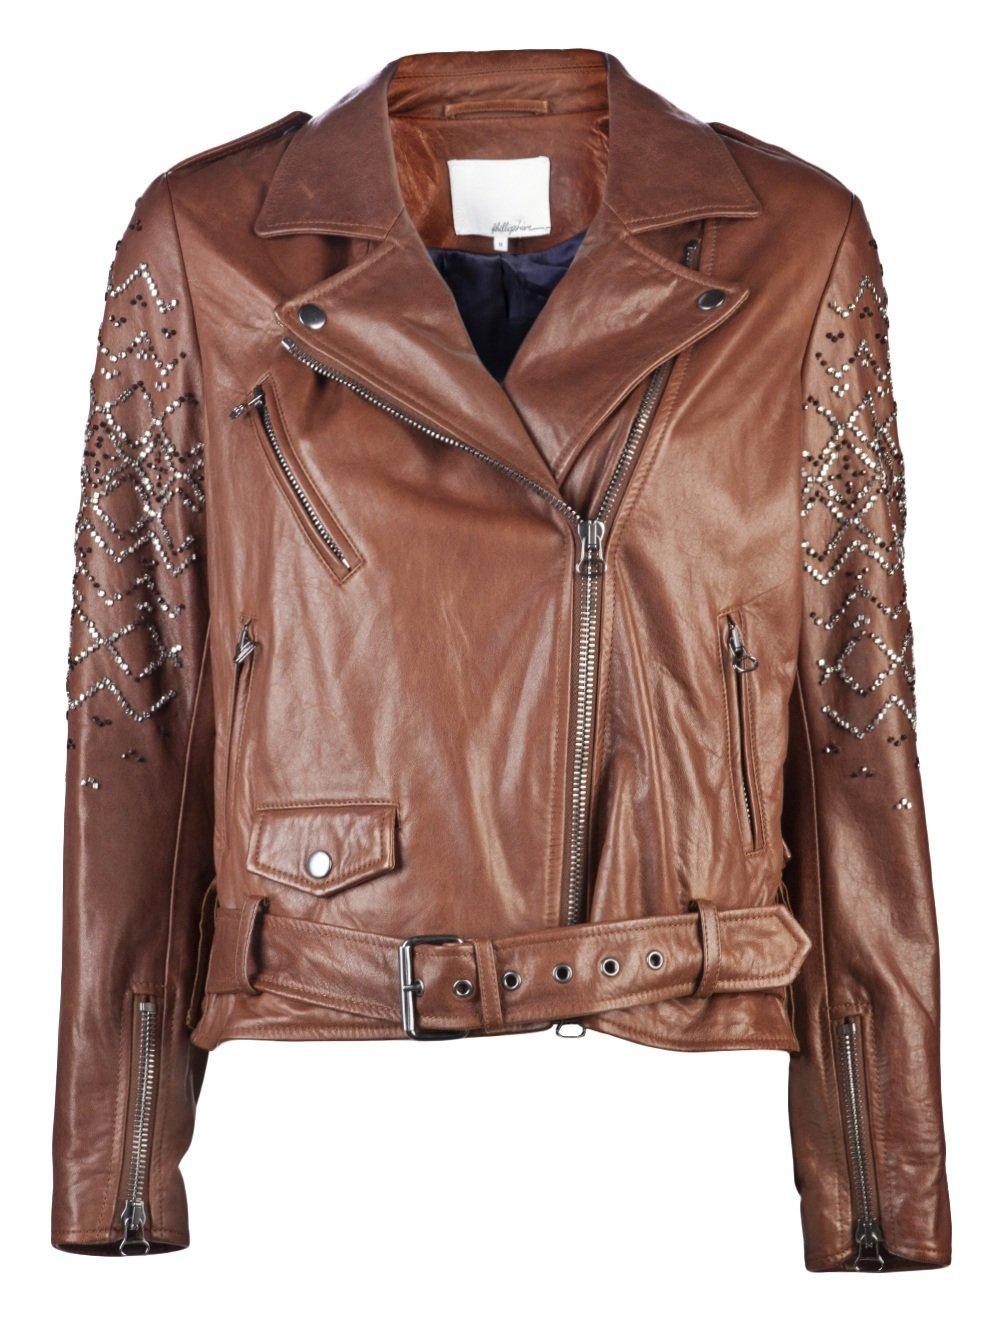 Philip lim leather jacket